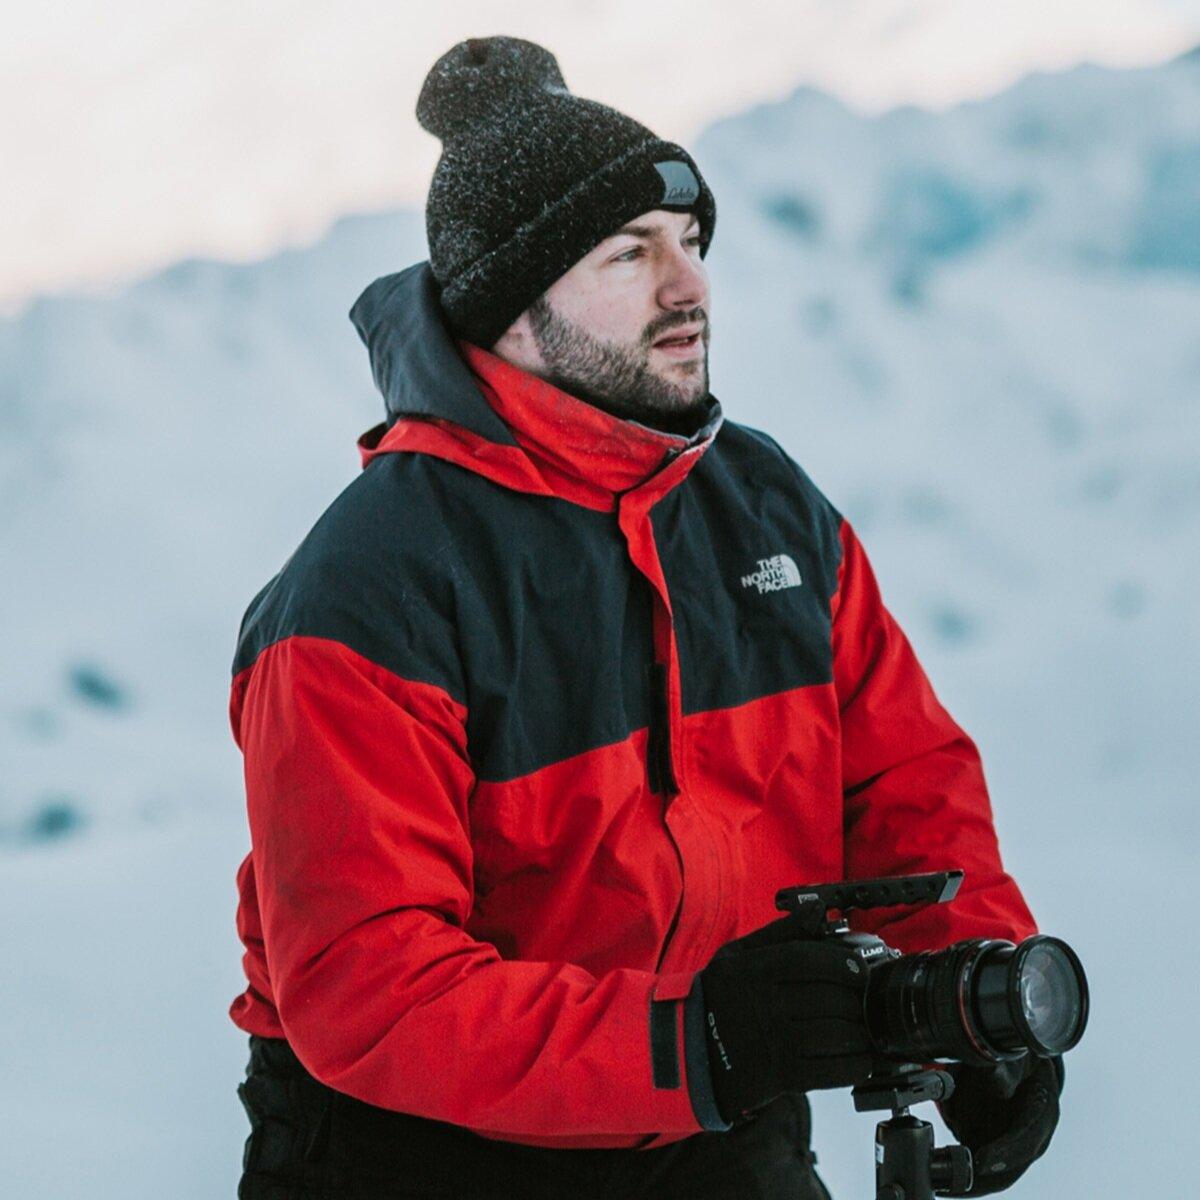 dan-redfield-alaska-photoventures-adventure-photographer-anchorage-based-4.jpg